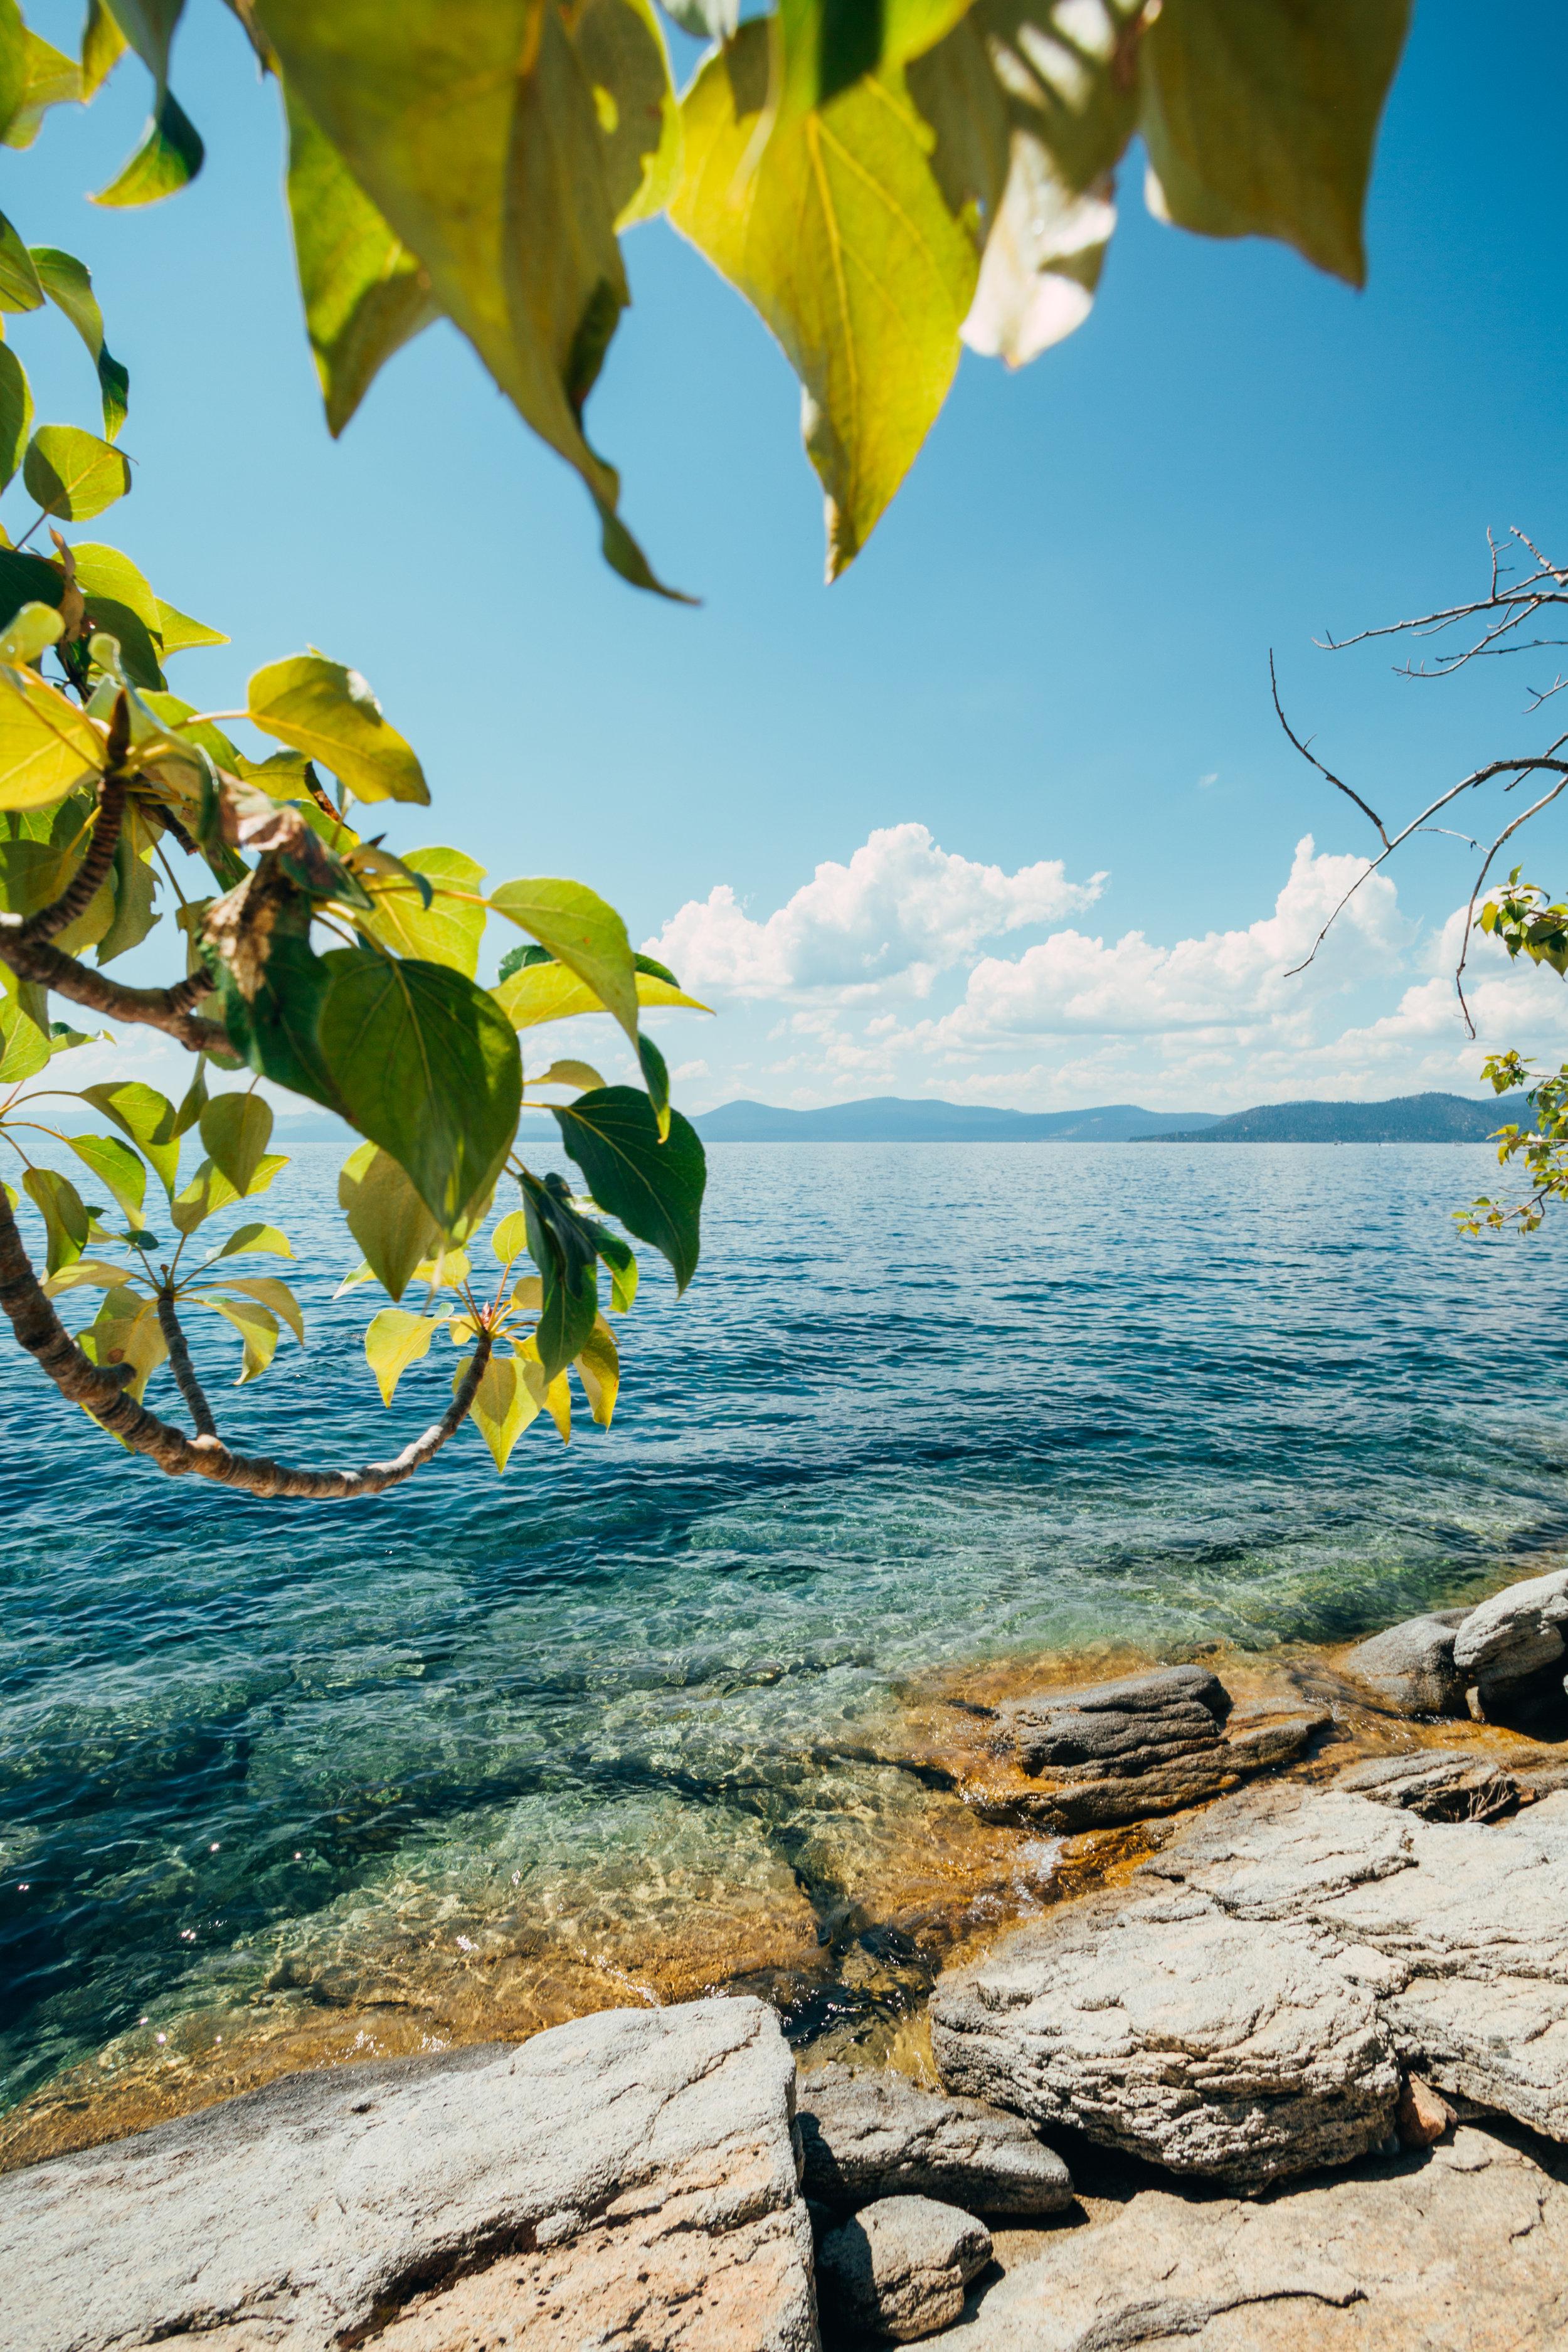 felicidad_de_lucas_travel_lake_tahoe_01.jpg